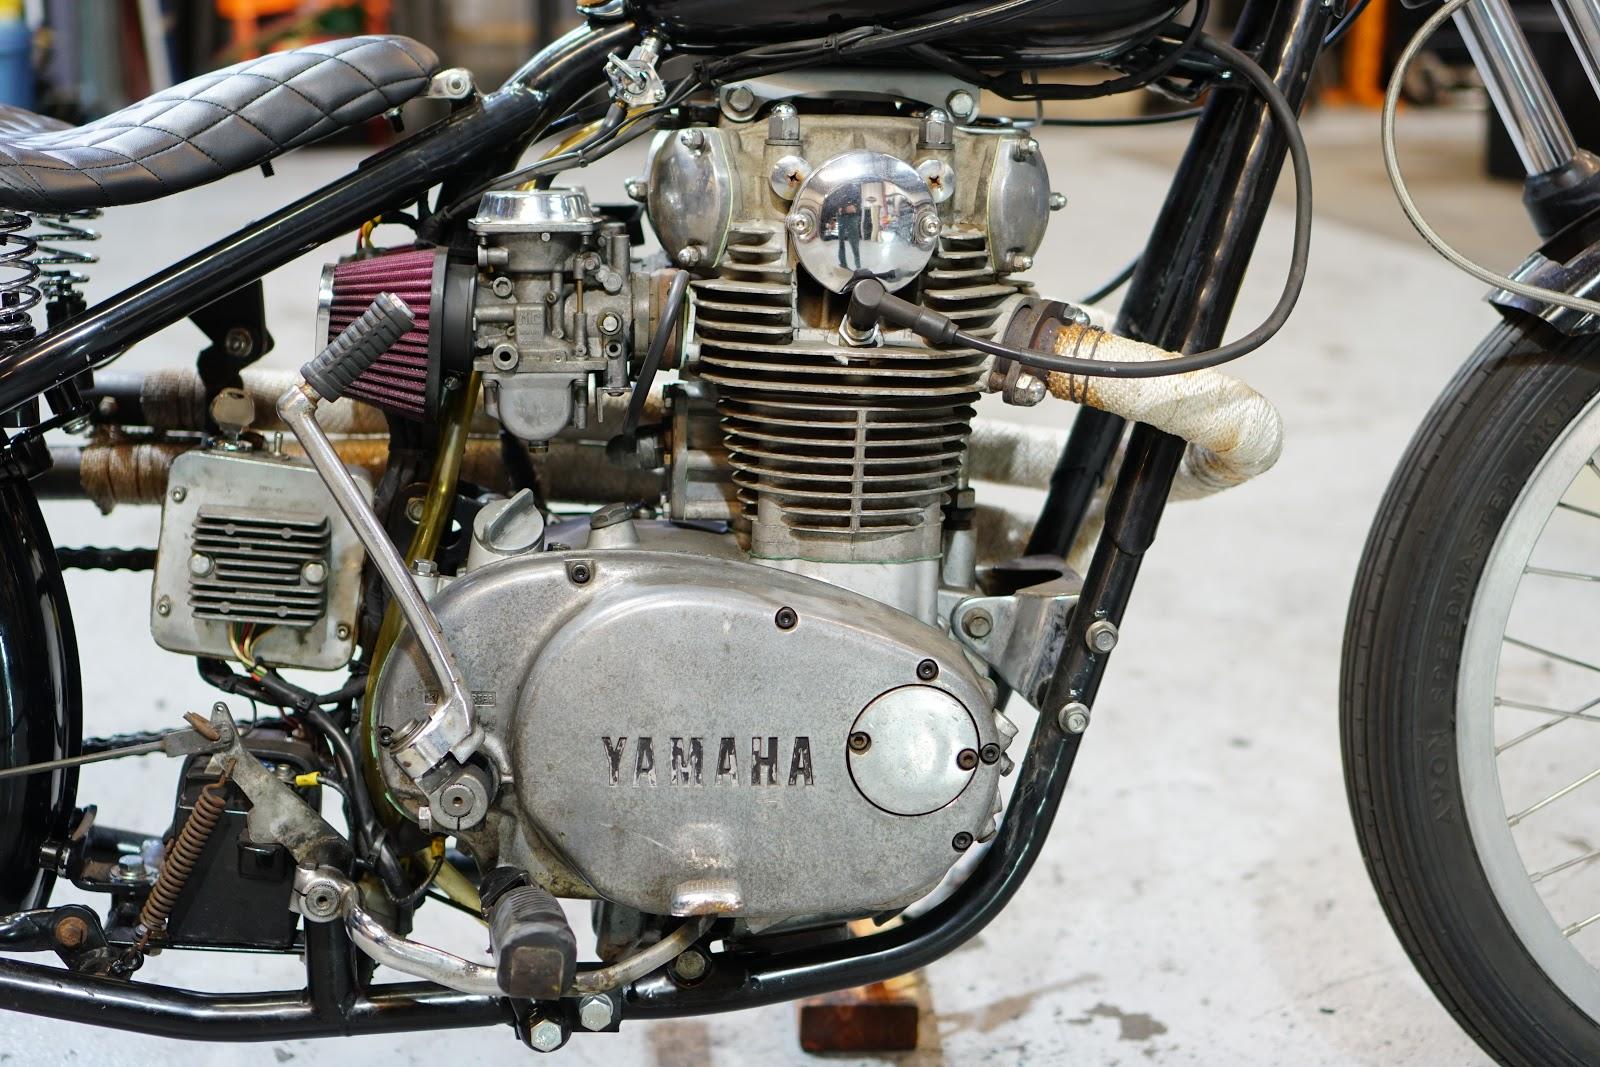 South Bay Street Machines: 1980 Yamaha XS650 Hardtail Rigid